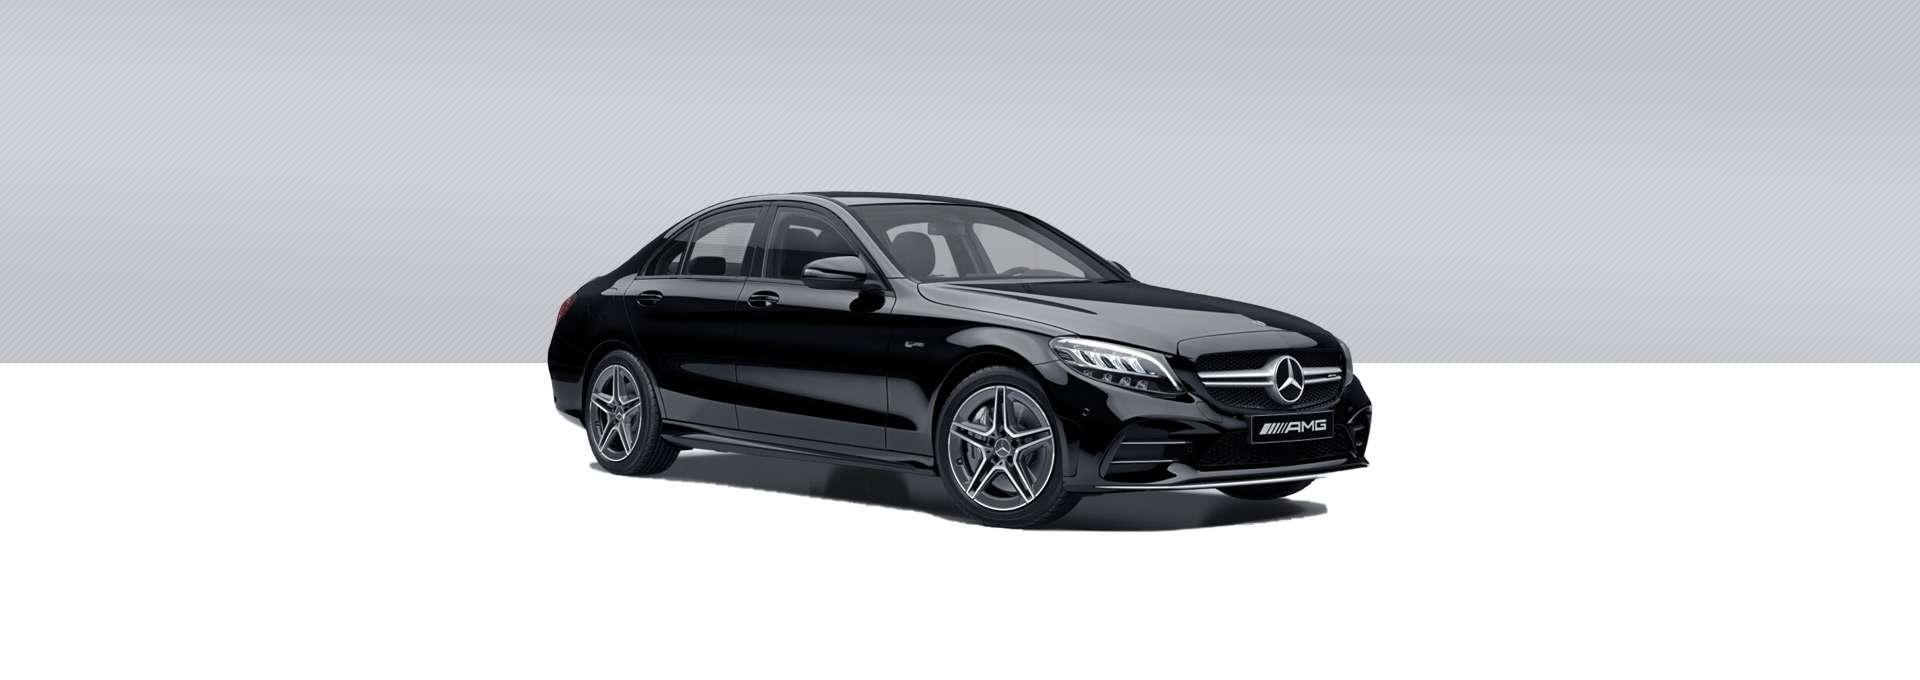 Mercedes Benz AMG CLASE C BERLINA